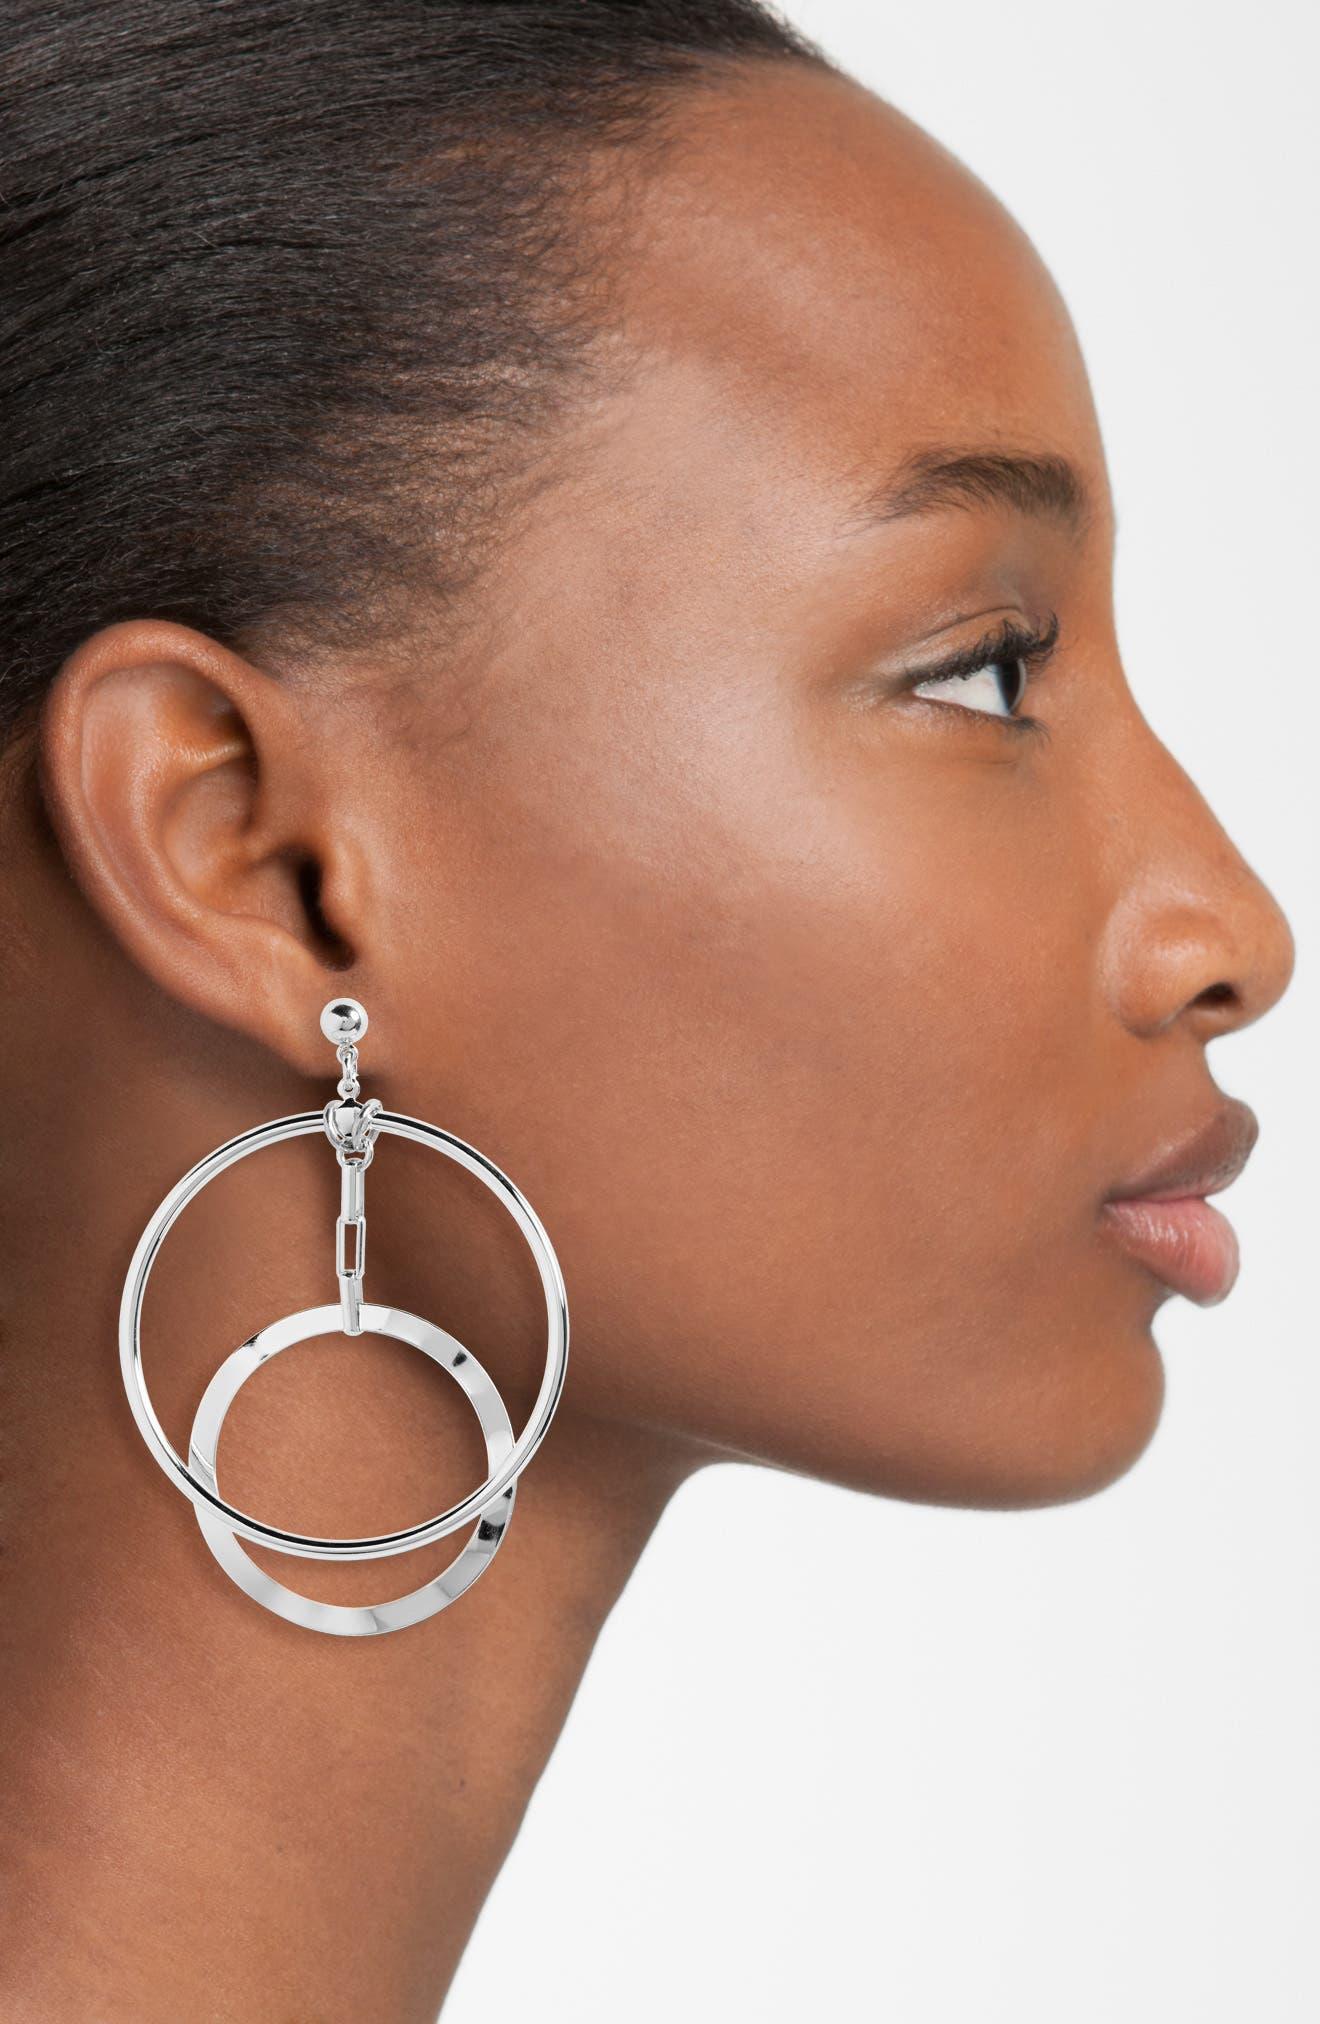 Eclipse Hoop Earrings,                             Alternate thumbnail 2, color,                             Silver